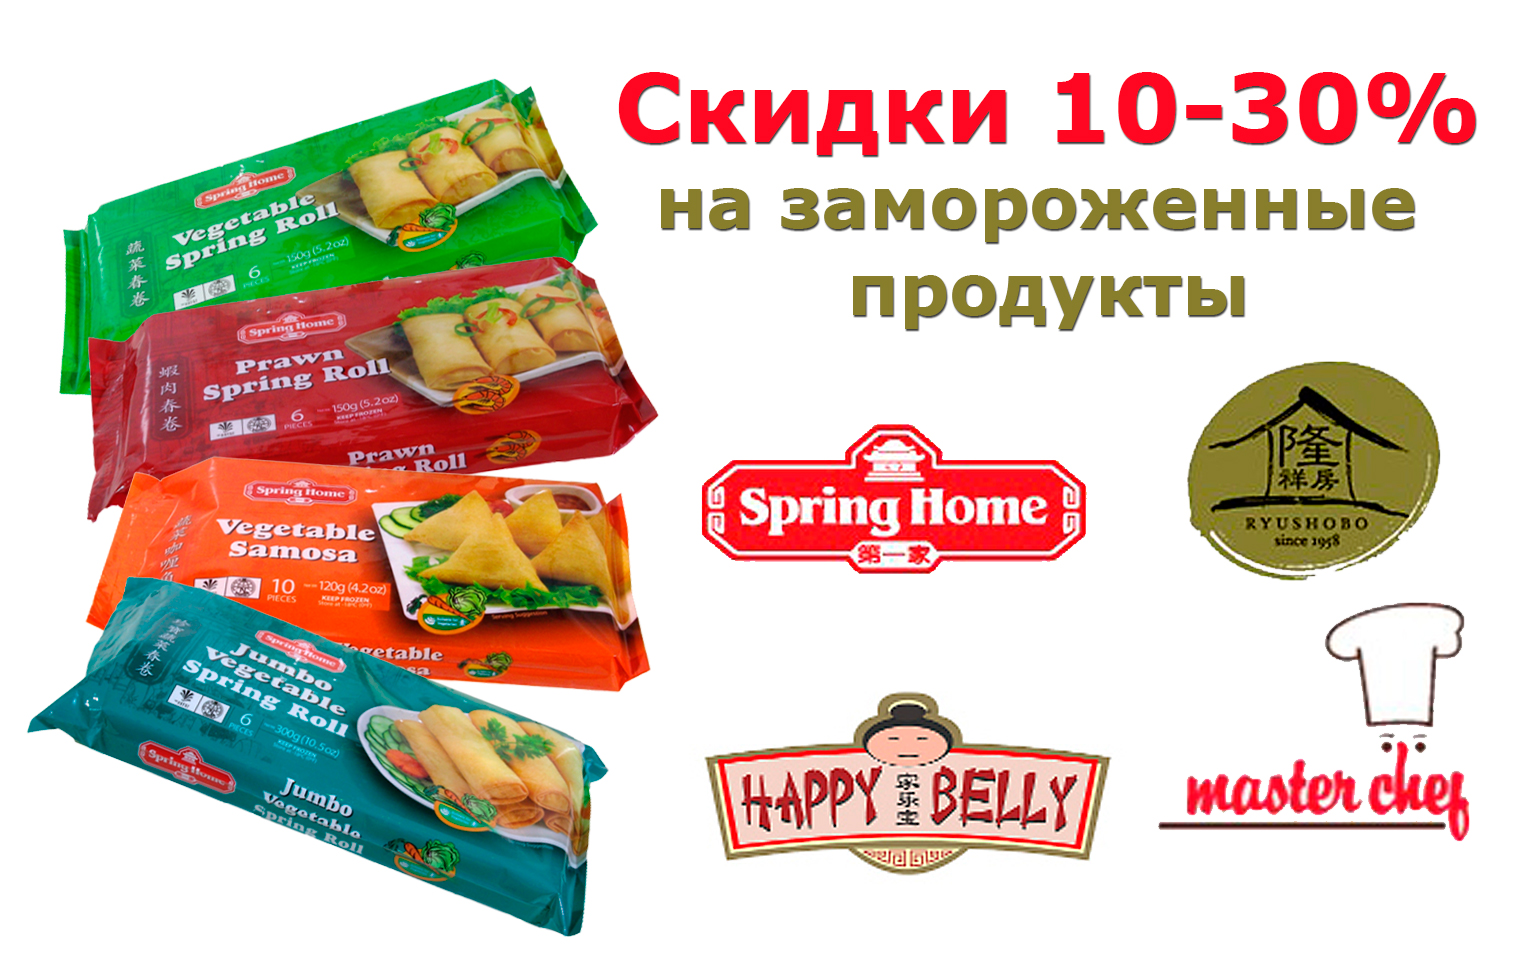 Скидка на замороженные полуфабрикаты Spring Home, Happy Belly, Ryushobo, Master Chefю